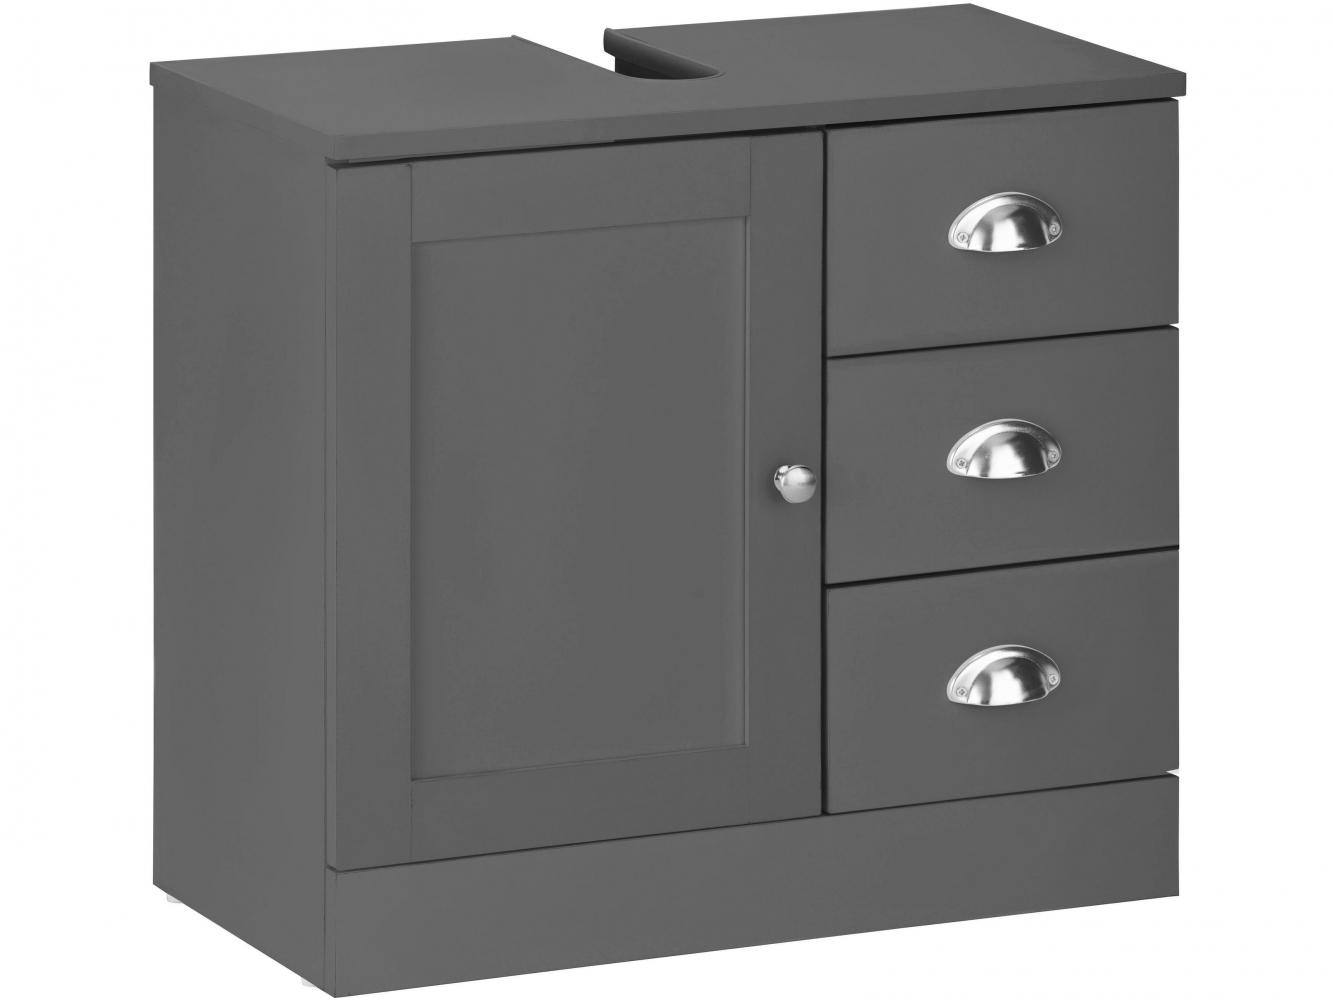 Umyvadlová skříňka Kiley I., 60 cm, šedá